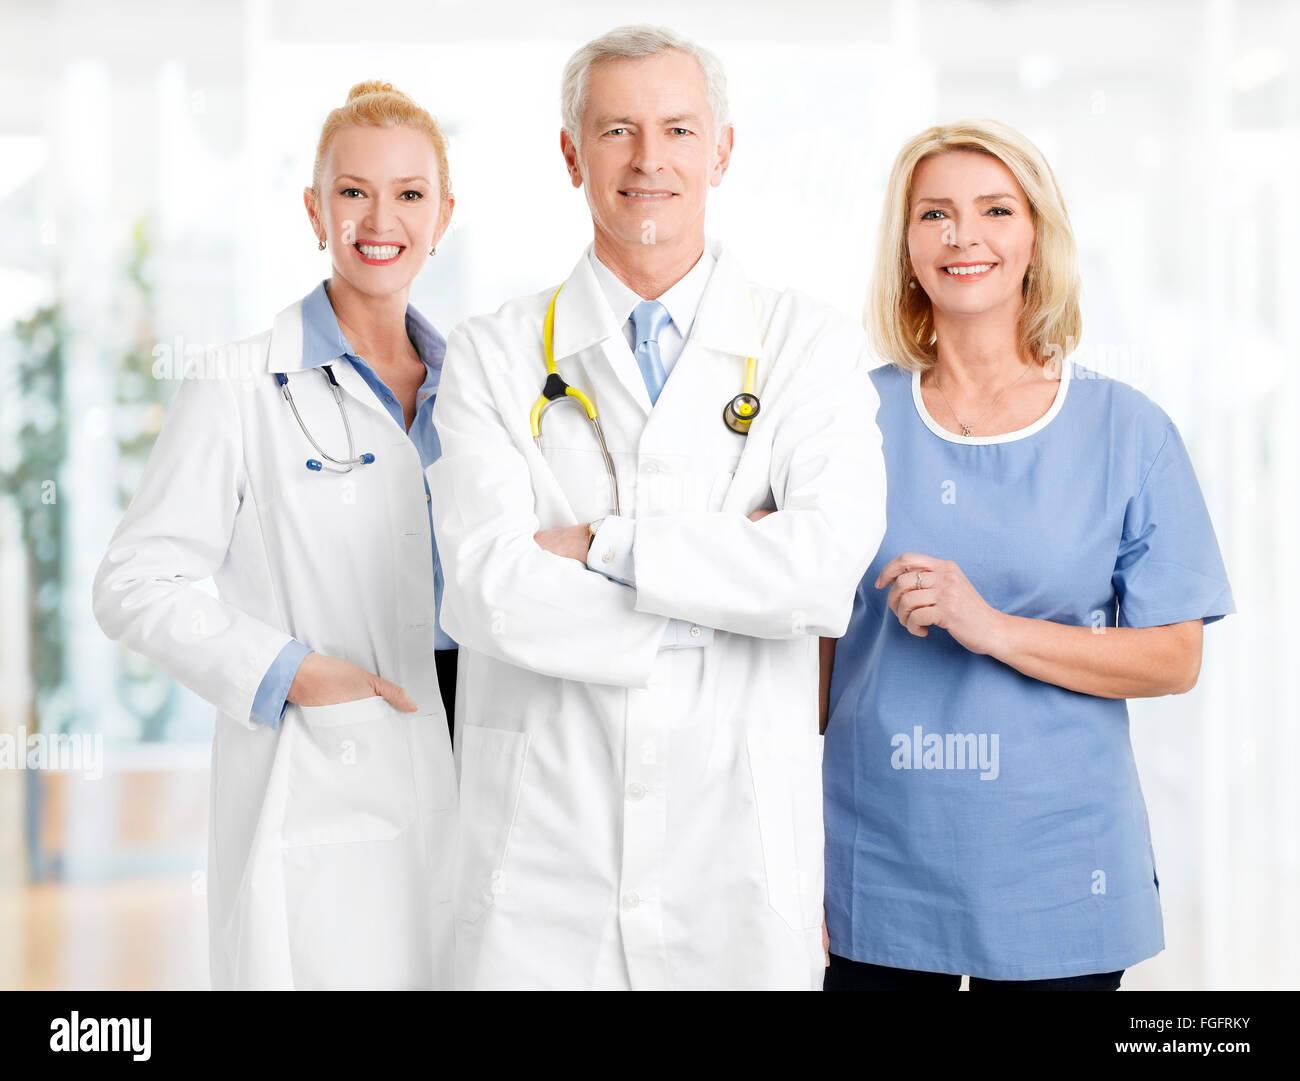 Nursing Assistant Stock Photos & Nursing Assistant Stock Images - Alamy